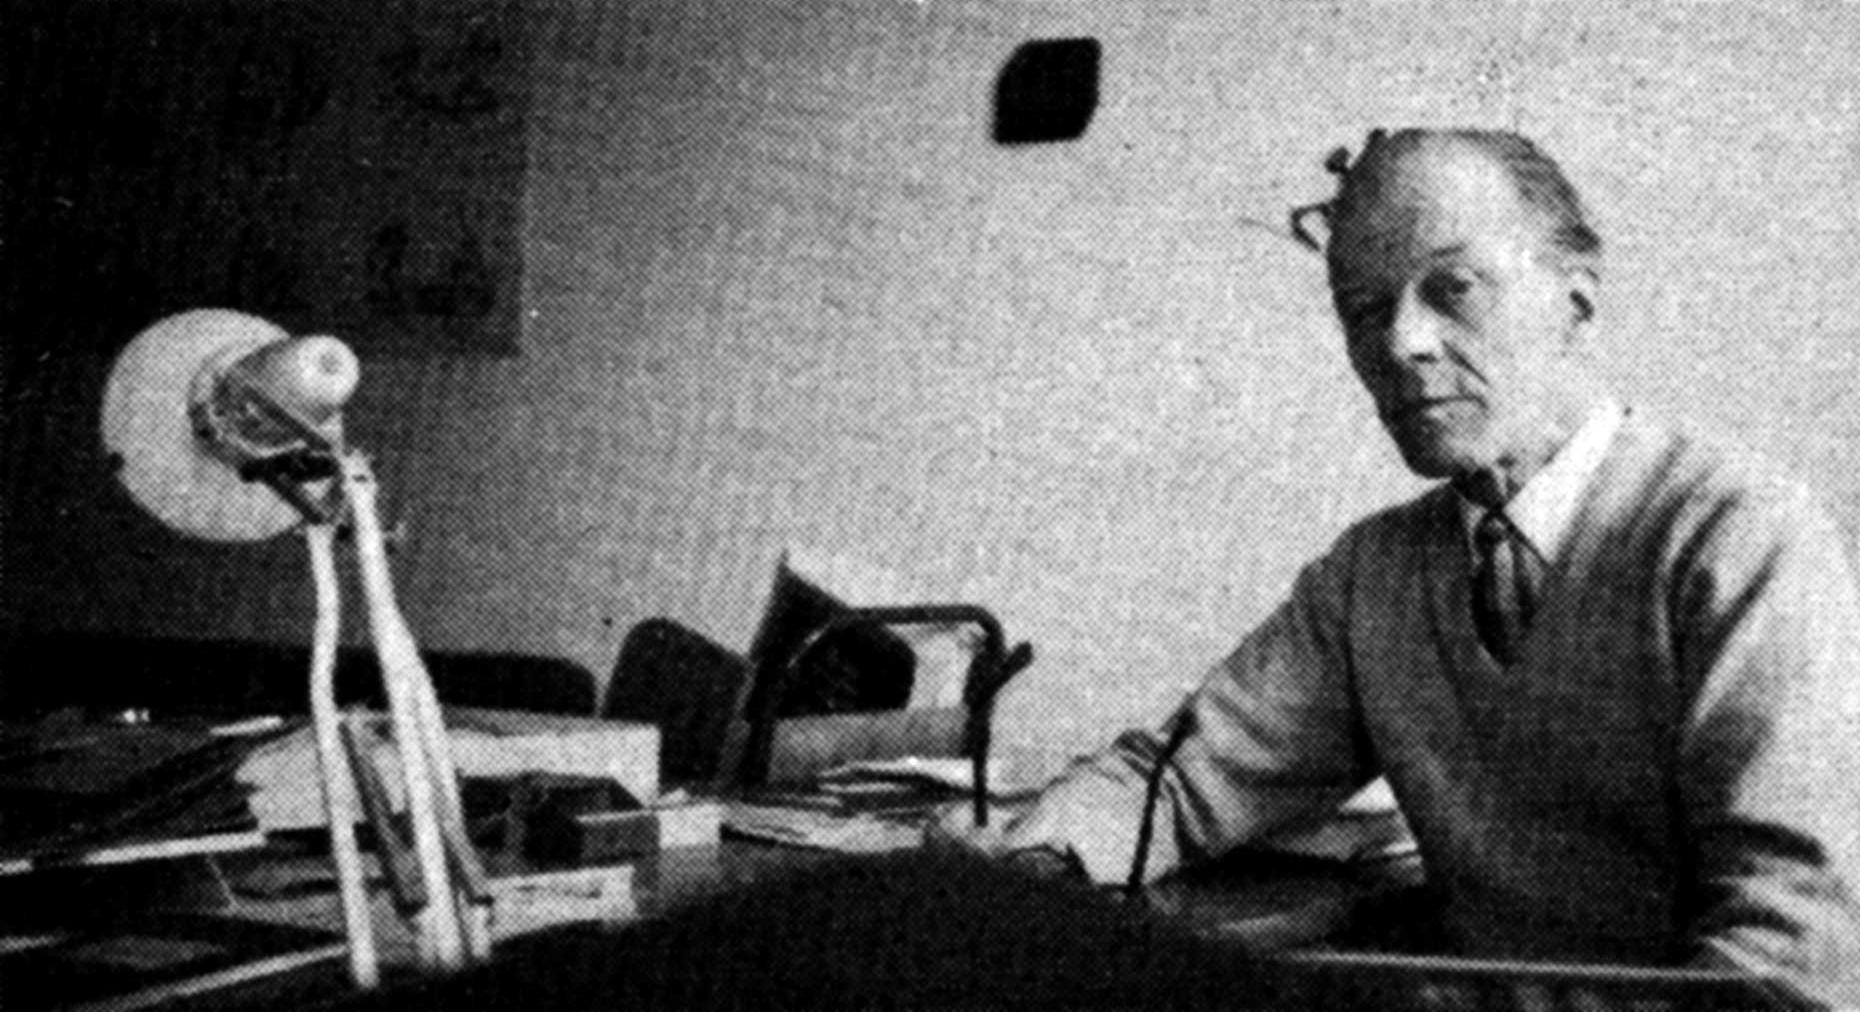 Rudolf Berner